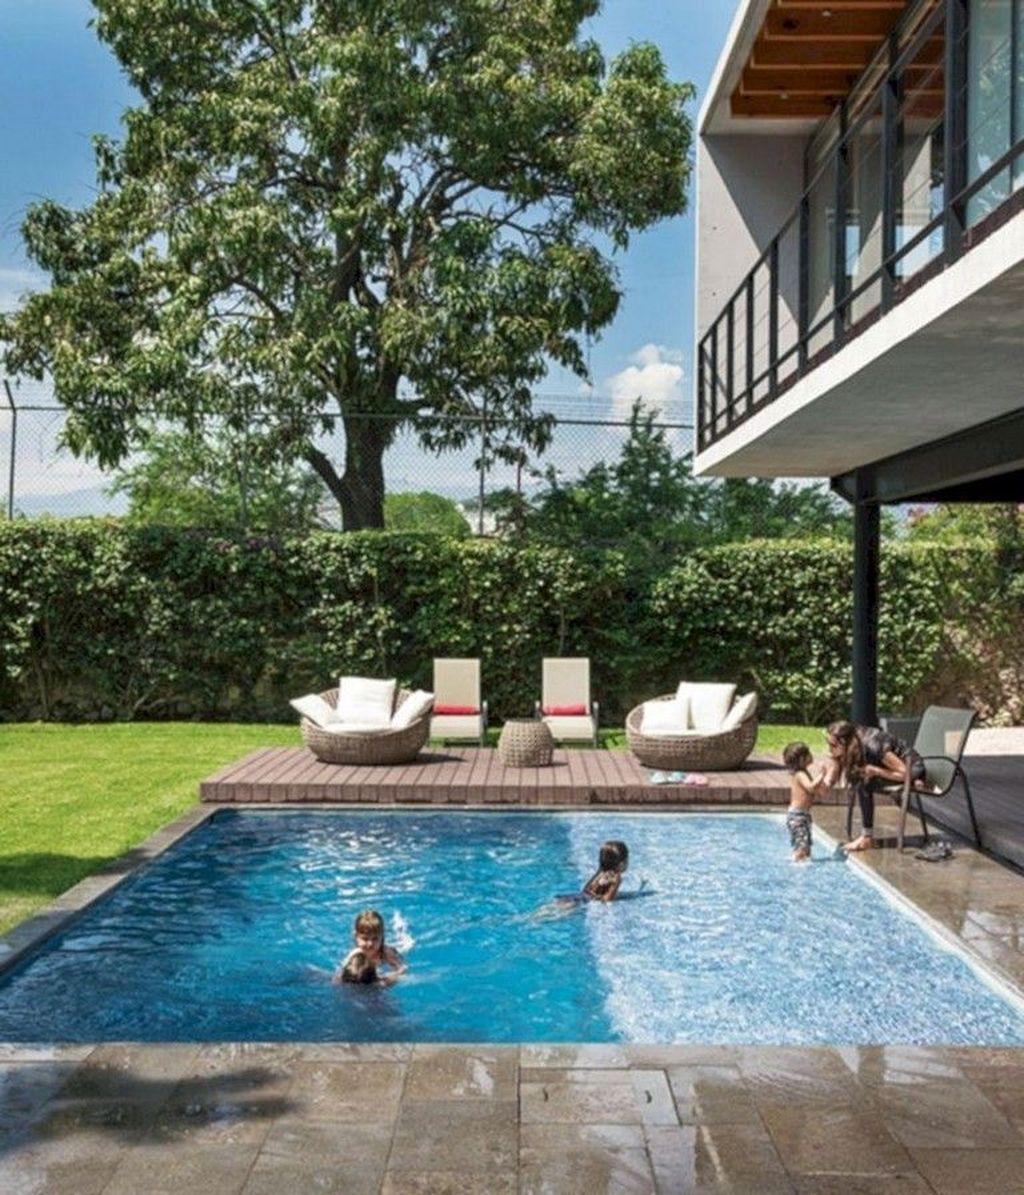 Stunning Backyard Pool Landscaping Ideas 10